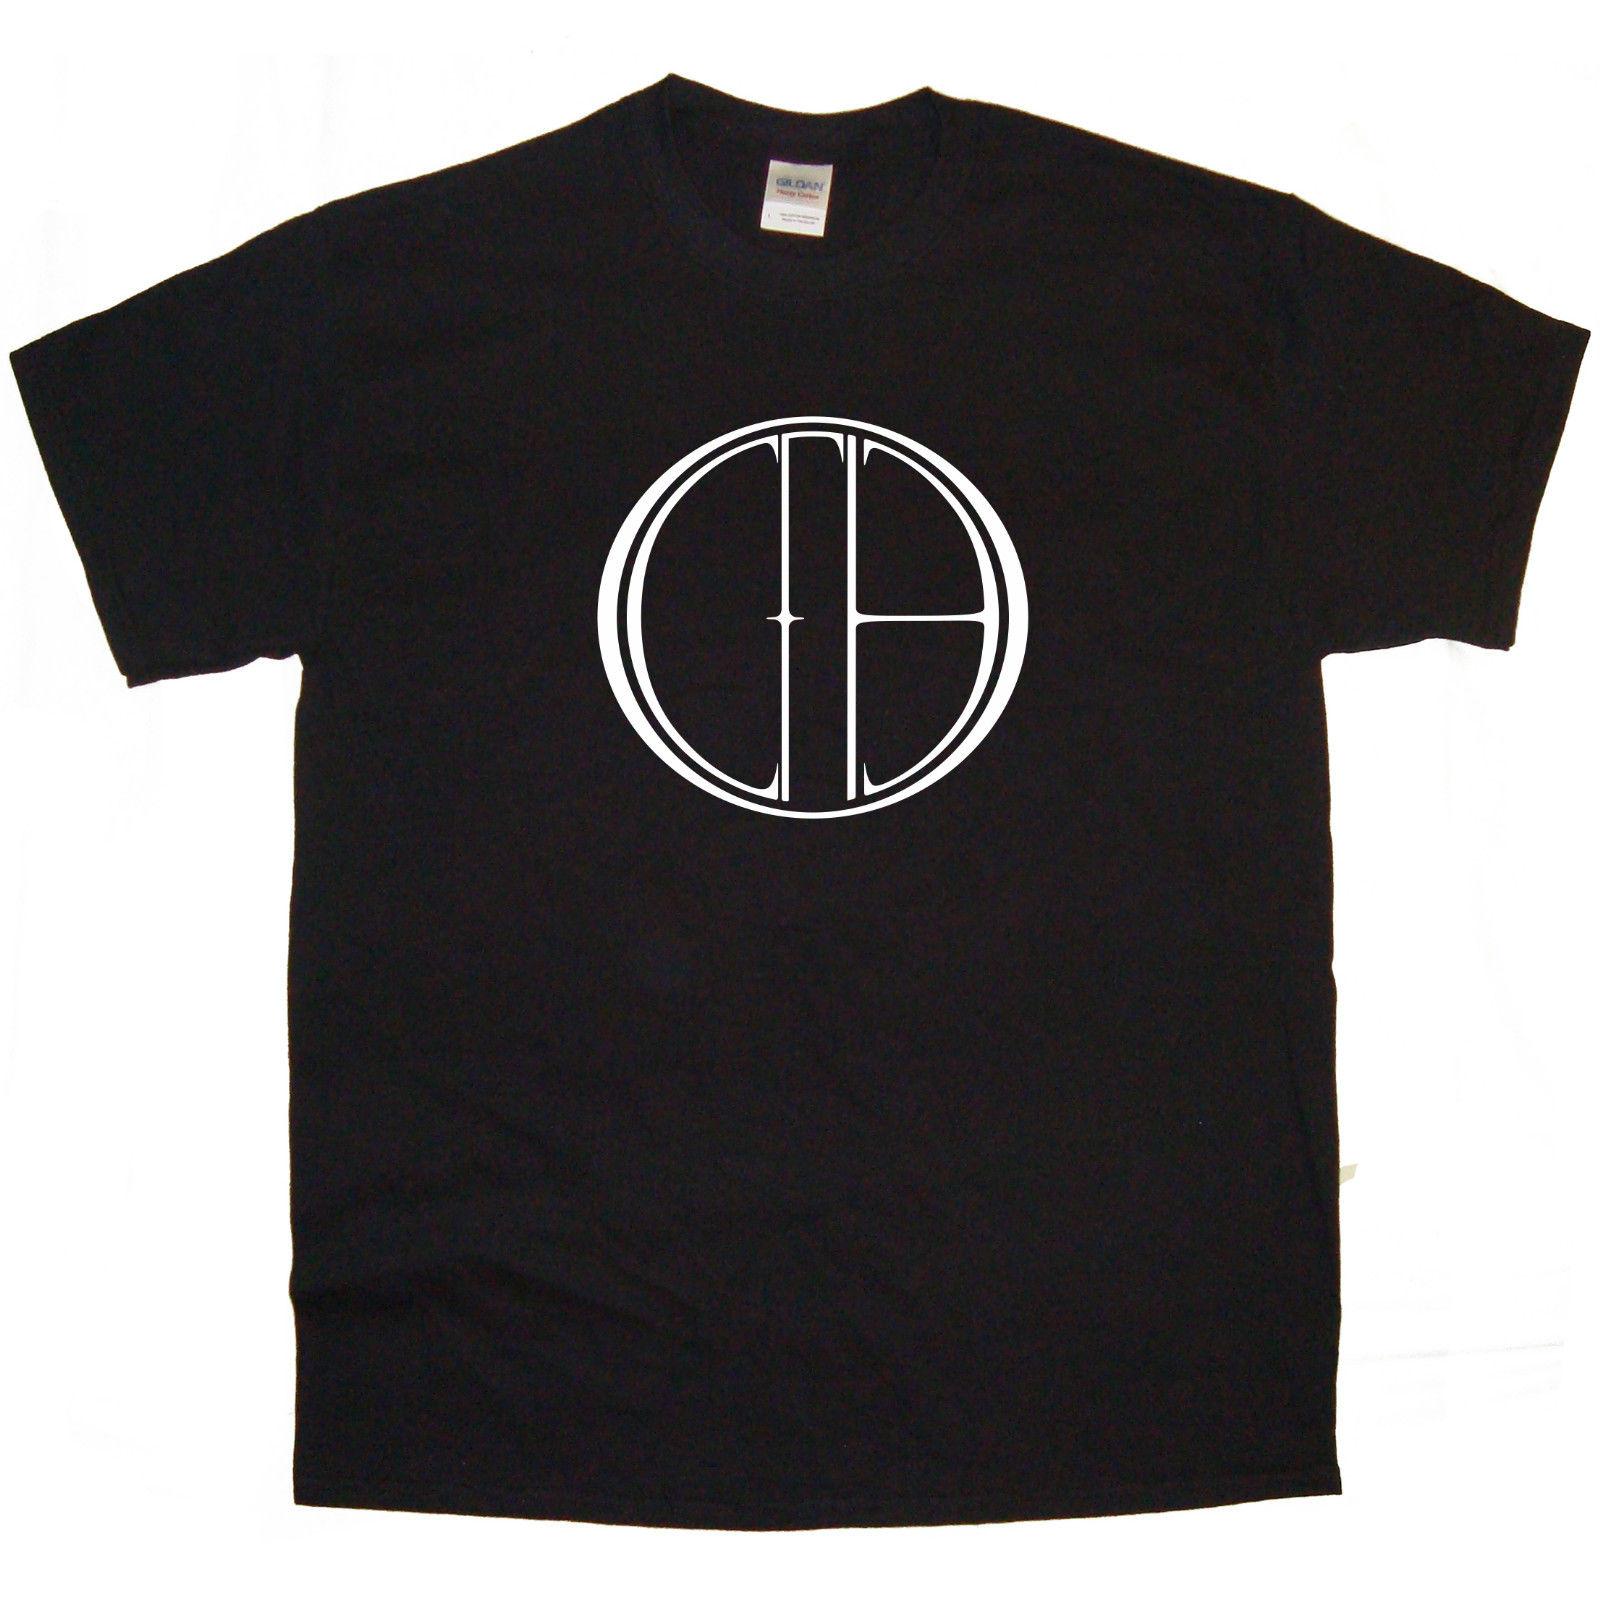 COWBOYS FROM HELL Band logo Rock Thrash Black DEATH HEAVY METAL PUNK POP t shirt tee t cloth(China (Mainland))